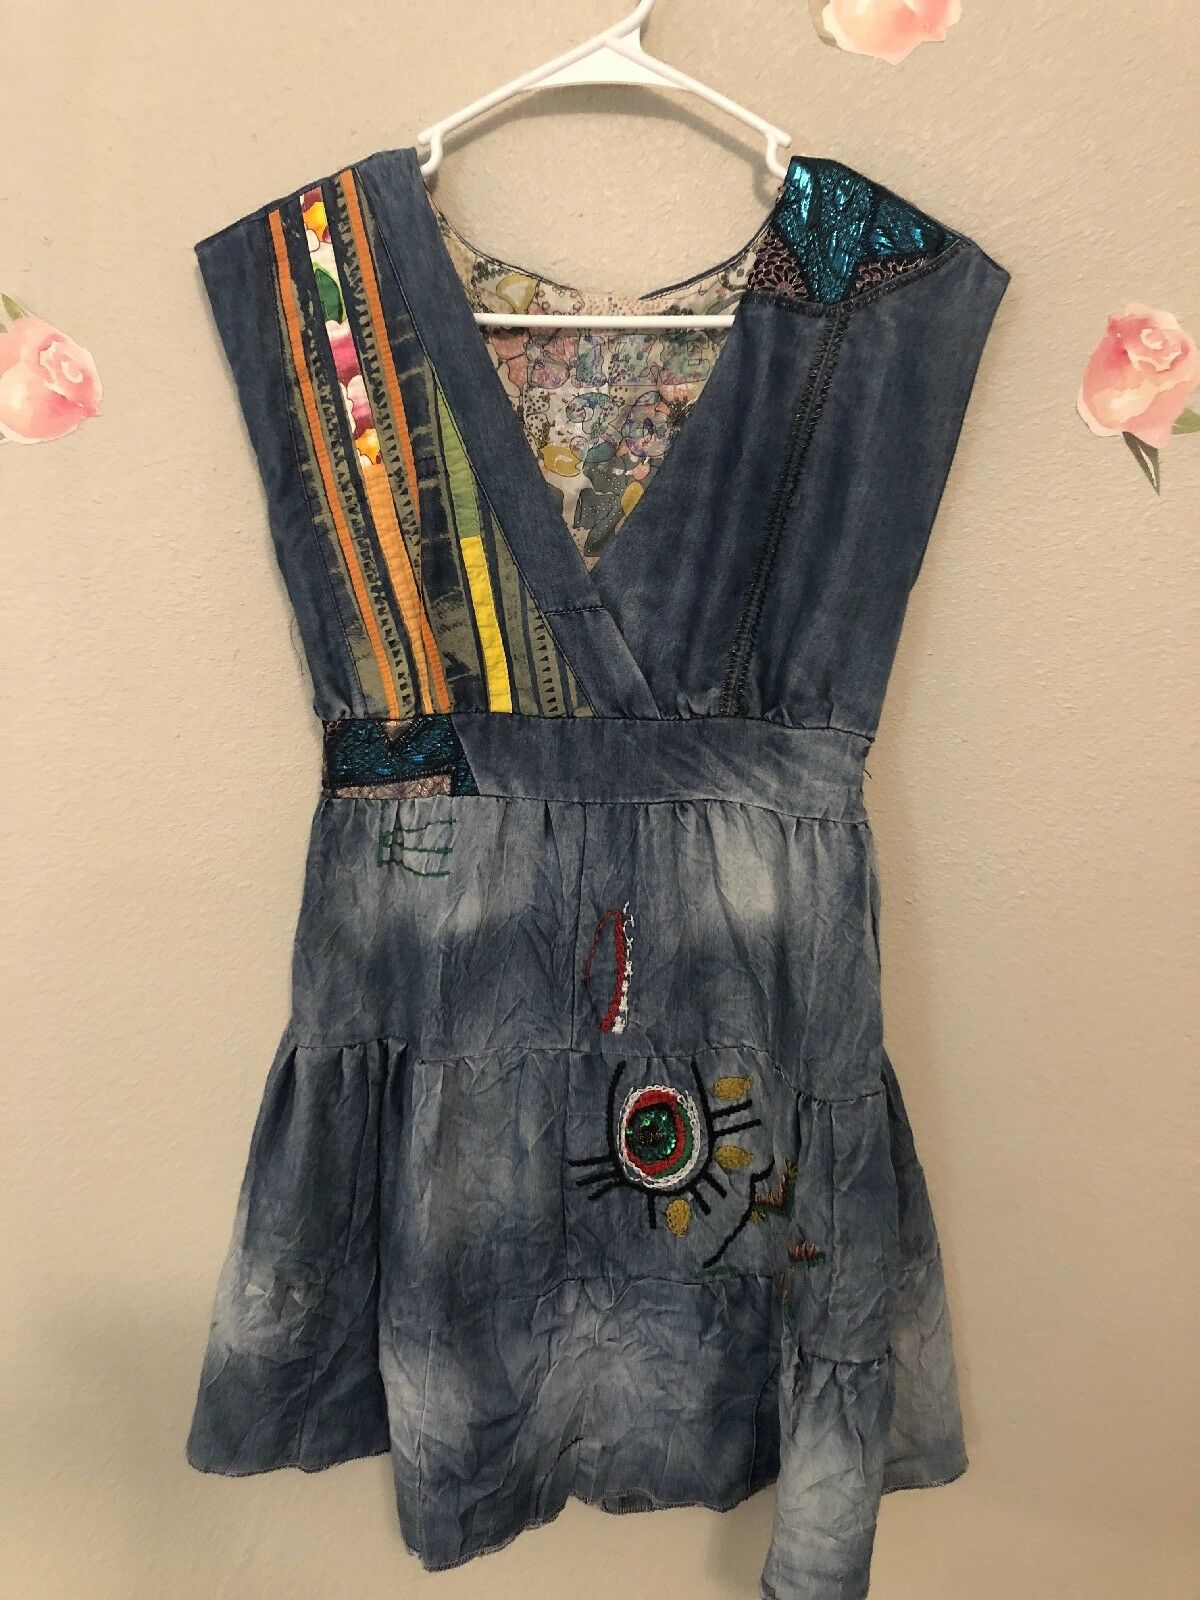 Desigual Denim MultiFarbe Dress Größe 36